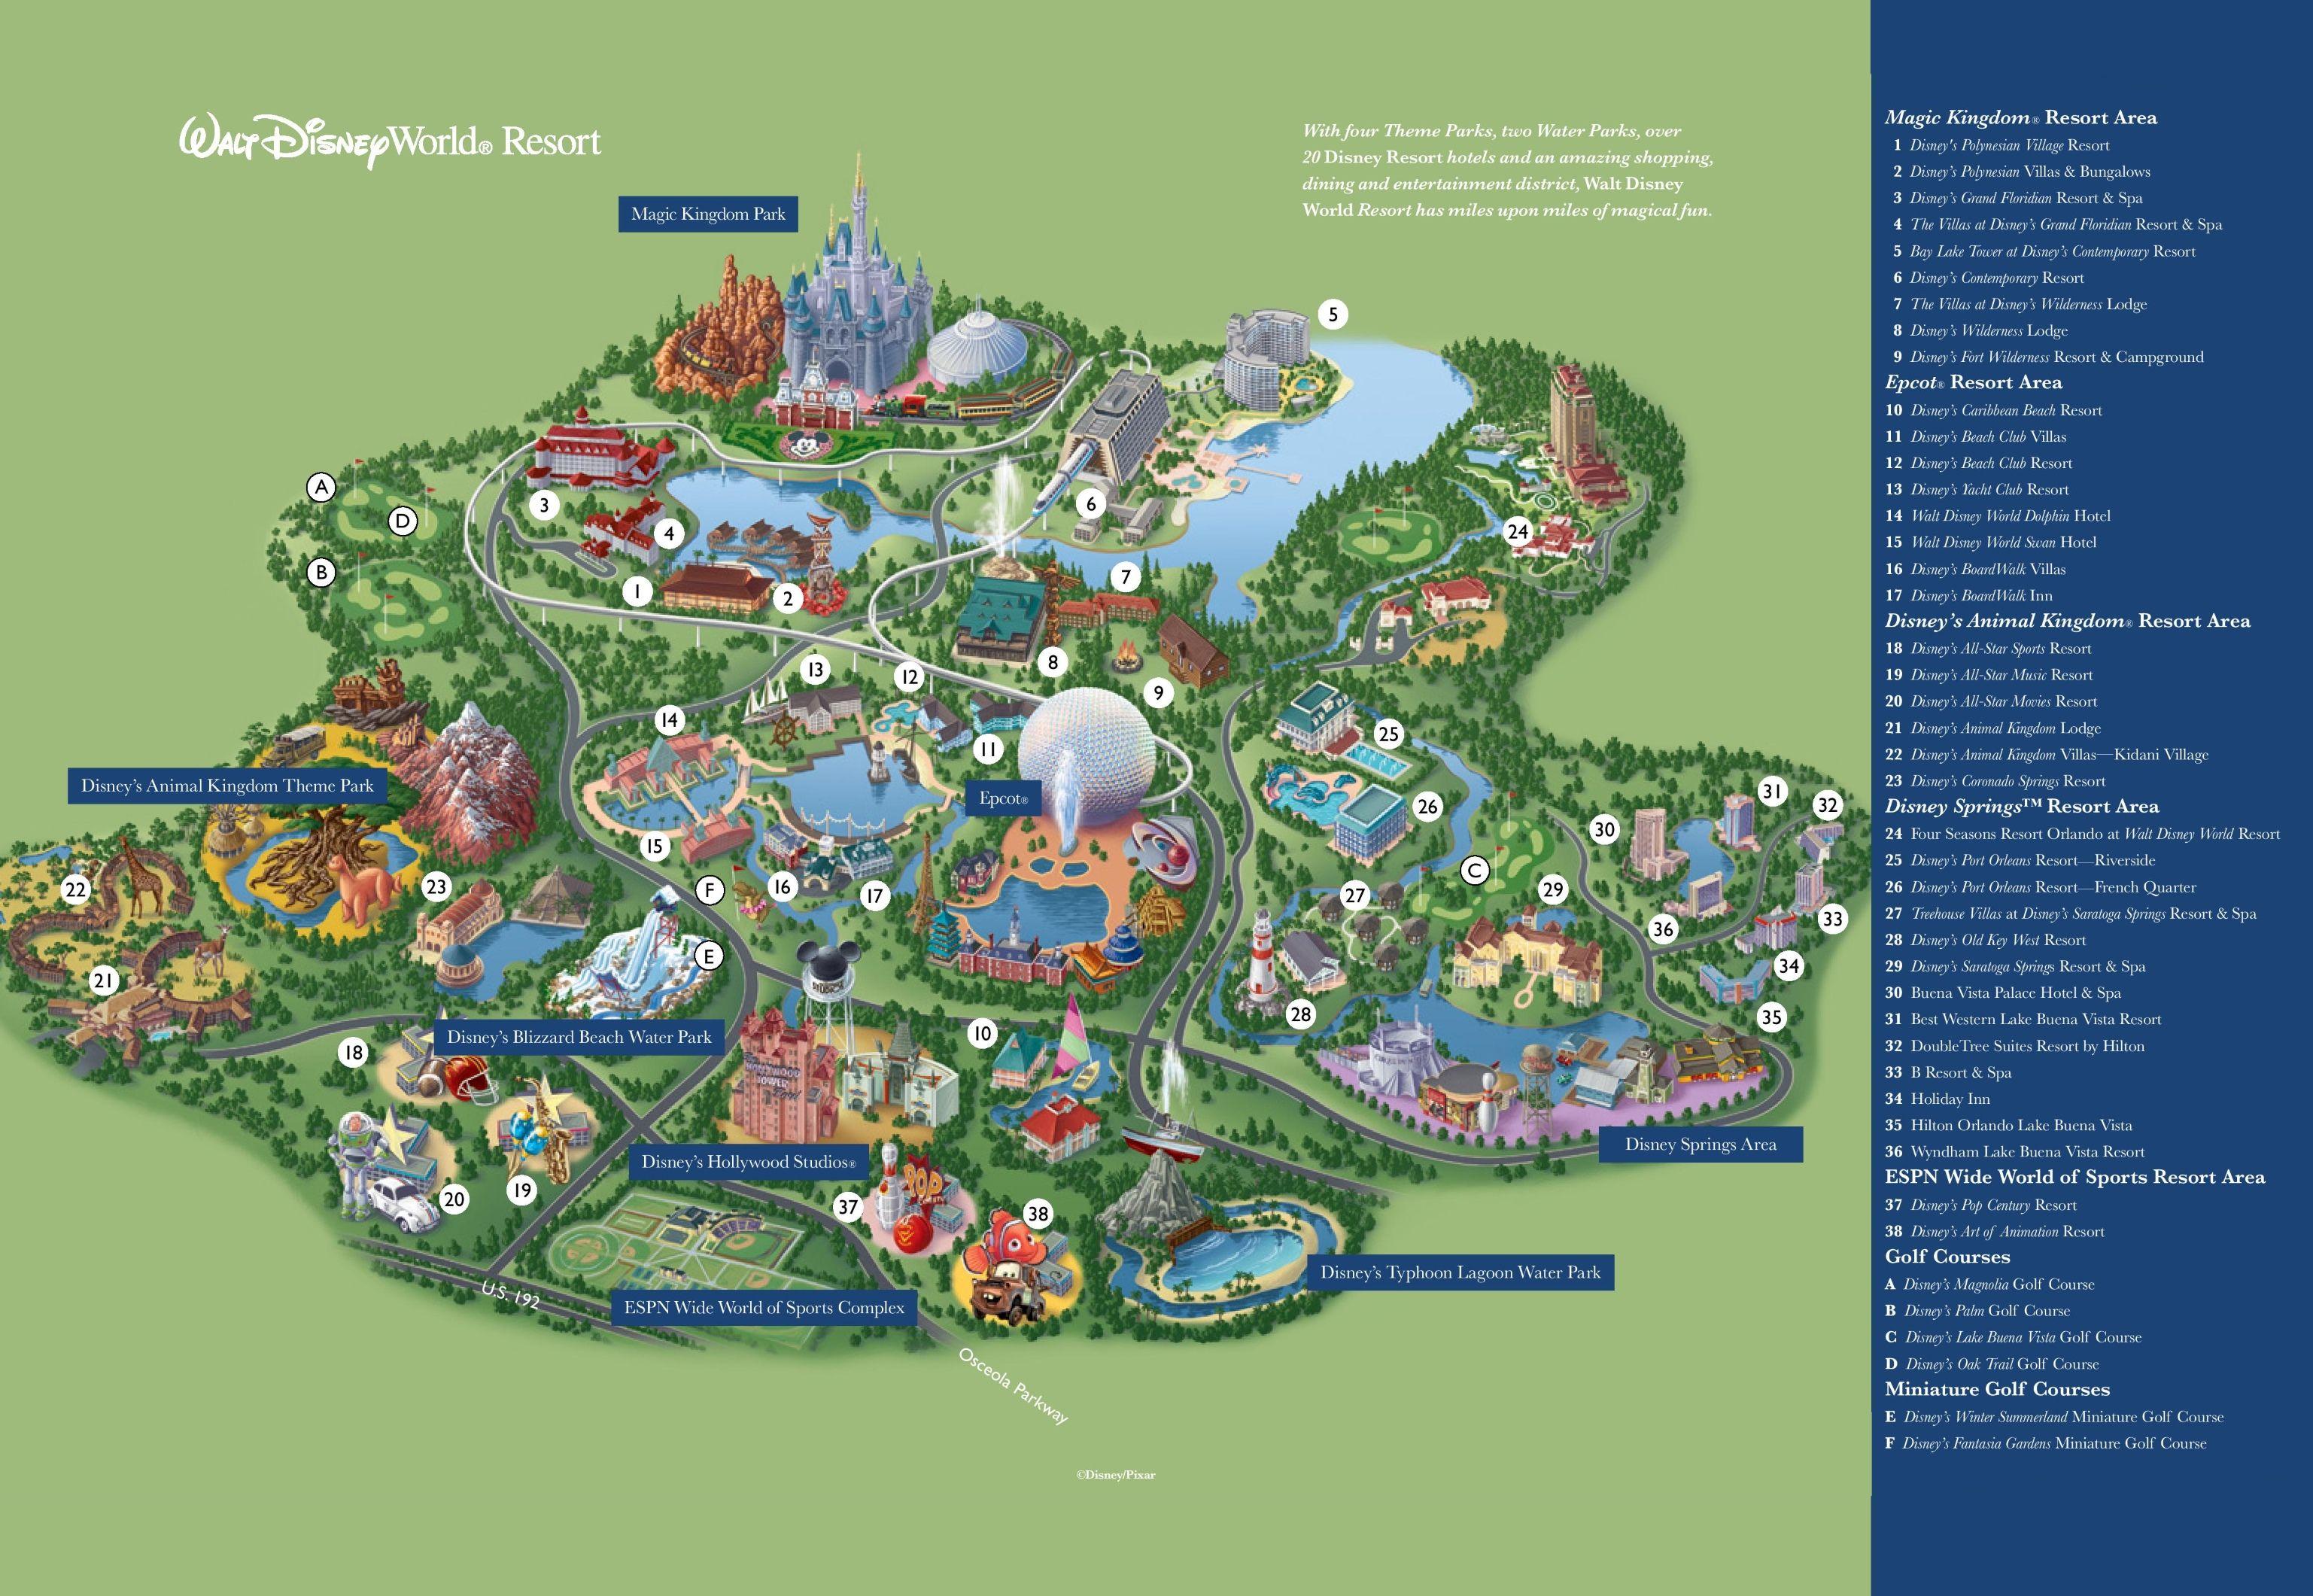 Orlando Walt Disney World Resort Map | Destination: Disney En 2019 - Map Of Hotels In Orlando Florida